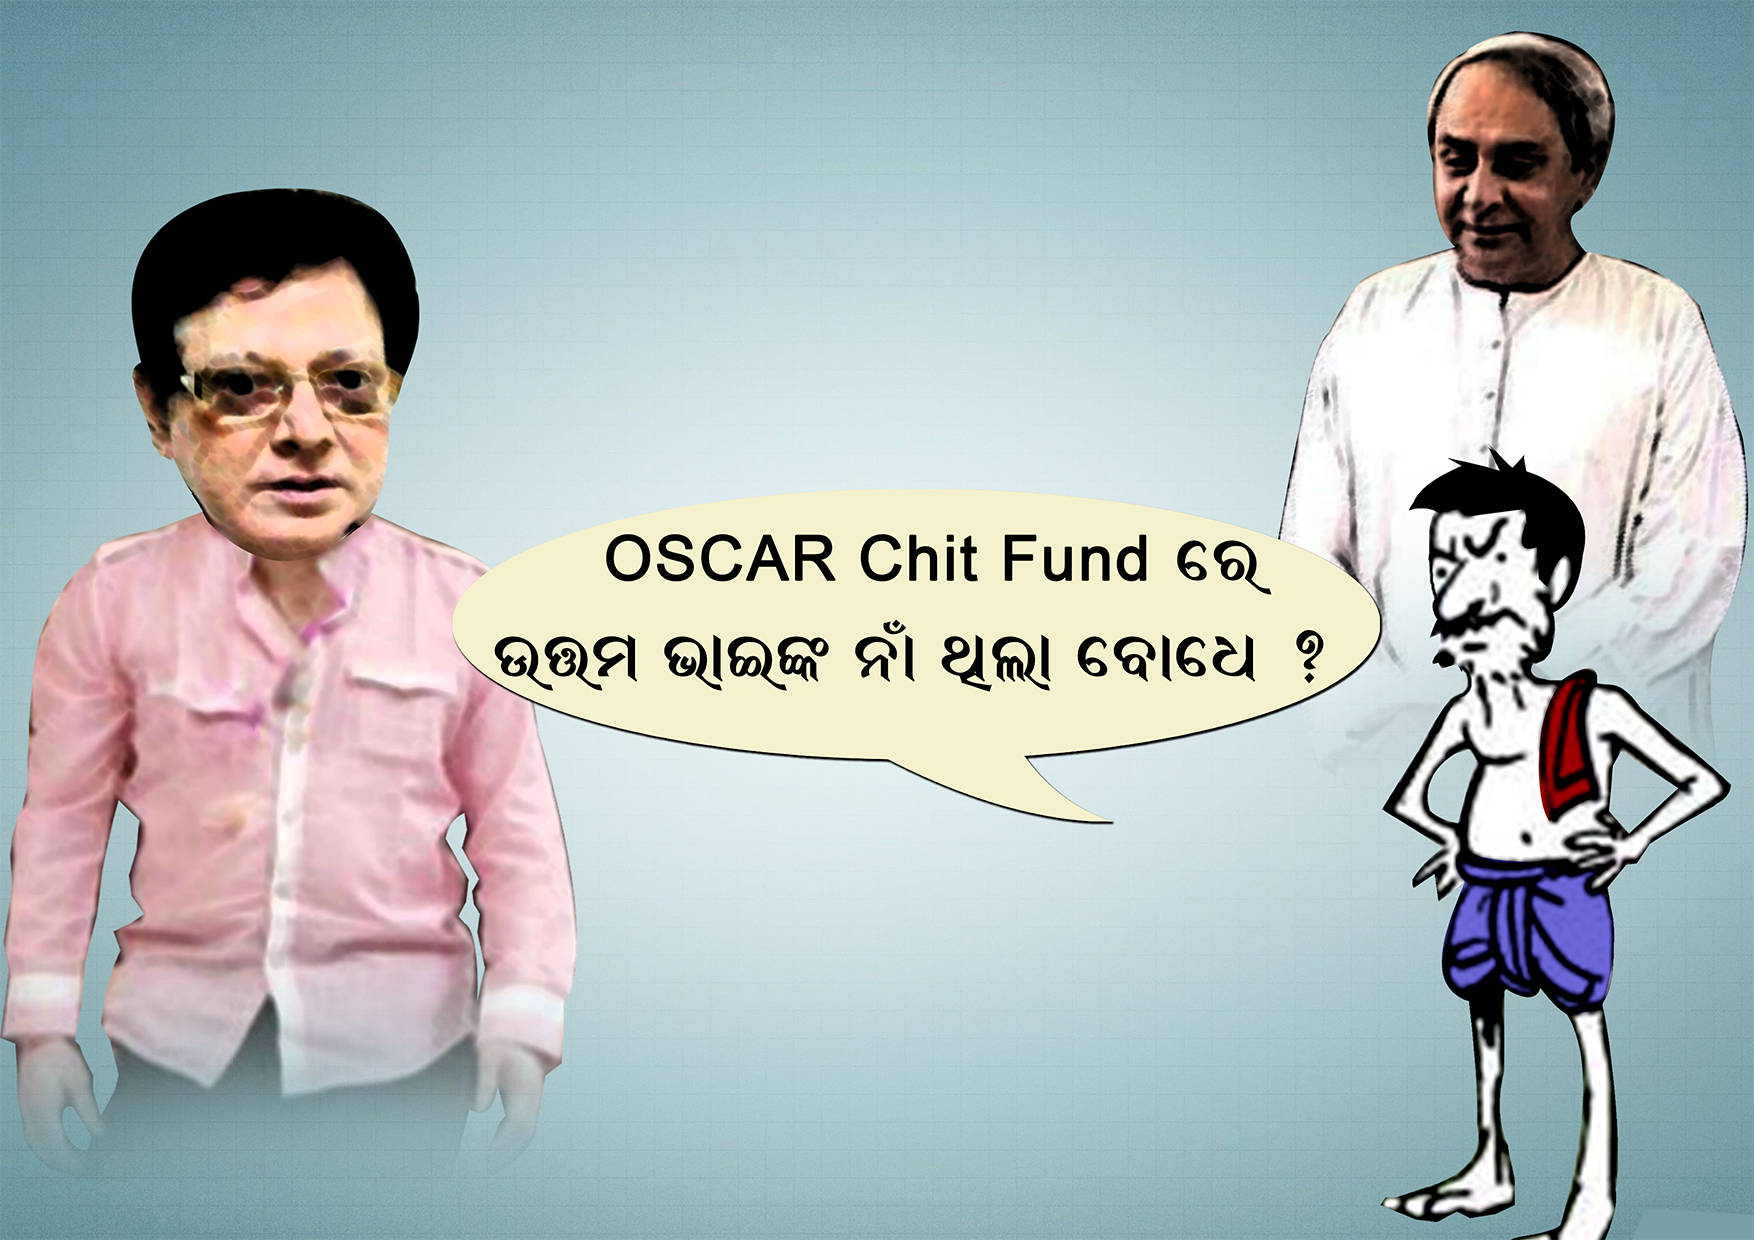 Khabar Odisha:Uttam-Mohanty-Oscar-Chit-Fund-Link-Cartoon